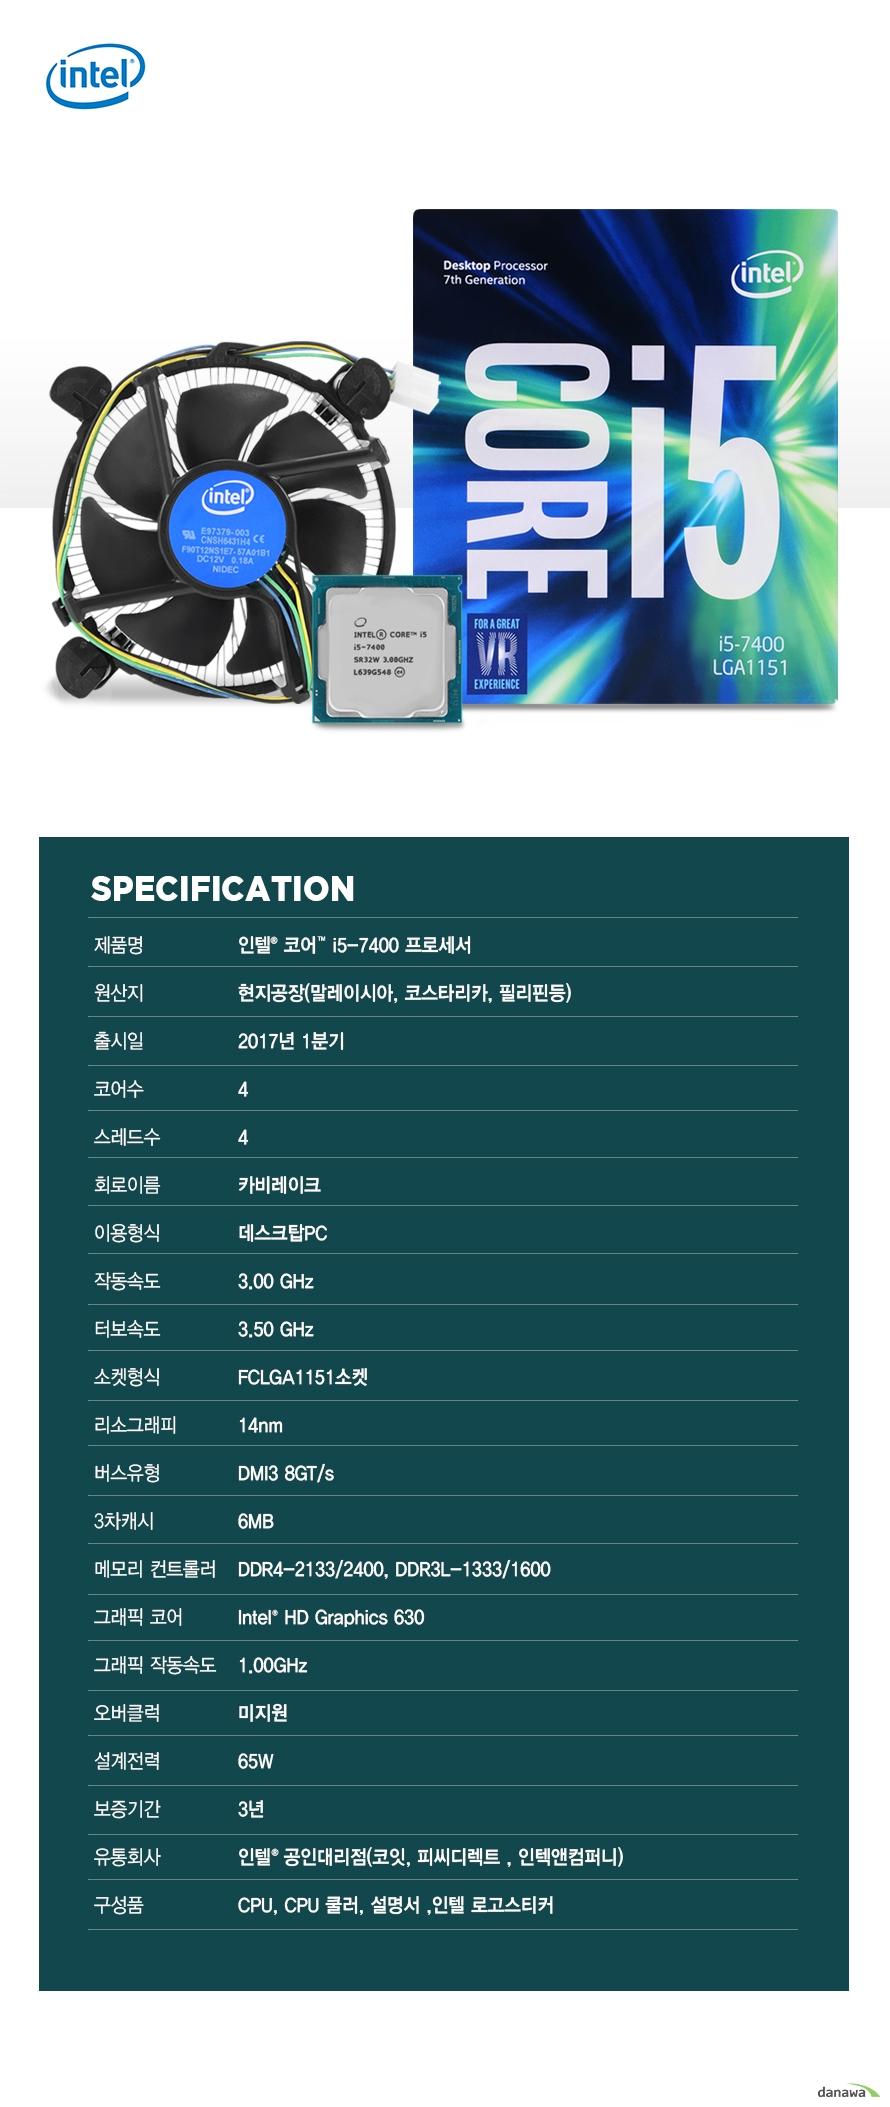 SPECIFICATION                제품명 인텔 코어 i5 - 7400 프로세서                        원산지 현지공장 말레이시아 코스타리카 필리핀등                출시일 2017년 1분기                코어수 4                스레드수 4                회로이름 카비레이크                이용형식 데스크탑PC                작동속도 3.00GHZ                터보속도 3.50GHZ                소켓형식 FCLGA1151소켓                리소그래피 14NM                버스유형 DMI3 8GT/S                3차캐시 6MB                메모리 컨트롤러 DDR4-2133/2400 DDR3L-1333/1600                그래픽 코어 INTEL HD GRAPHICS 630                그래픽 작동속도 1.00GHZ                오버클럭 미지원                설계전력 65W                보증기간 3년                유통회사 인텔 공인대리점 코잇 피씨디렉트 인텍엔 컴퍼니                구성품 CPU CPU쿨러 설명서 인텔 로고스티커